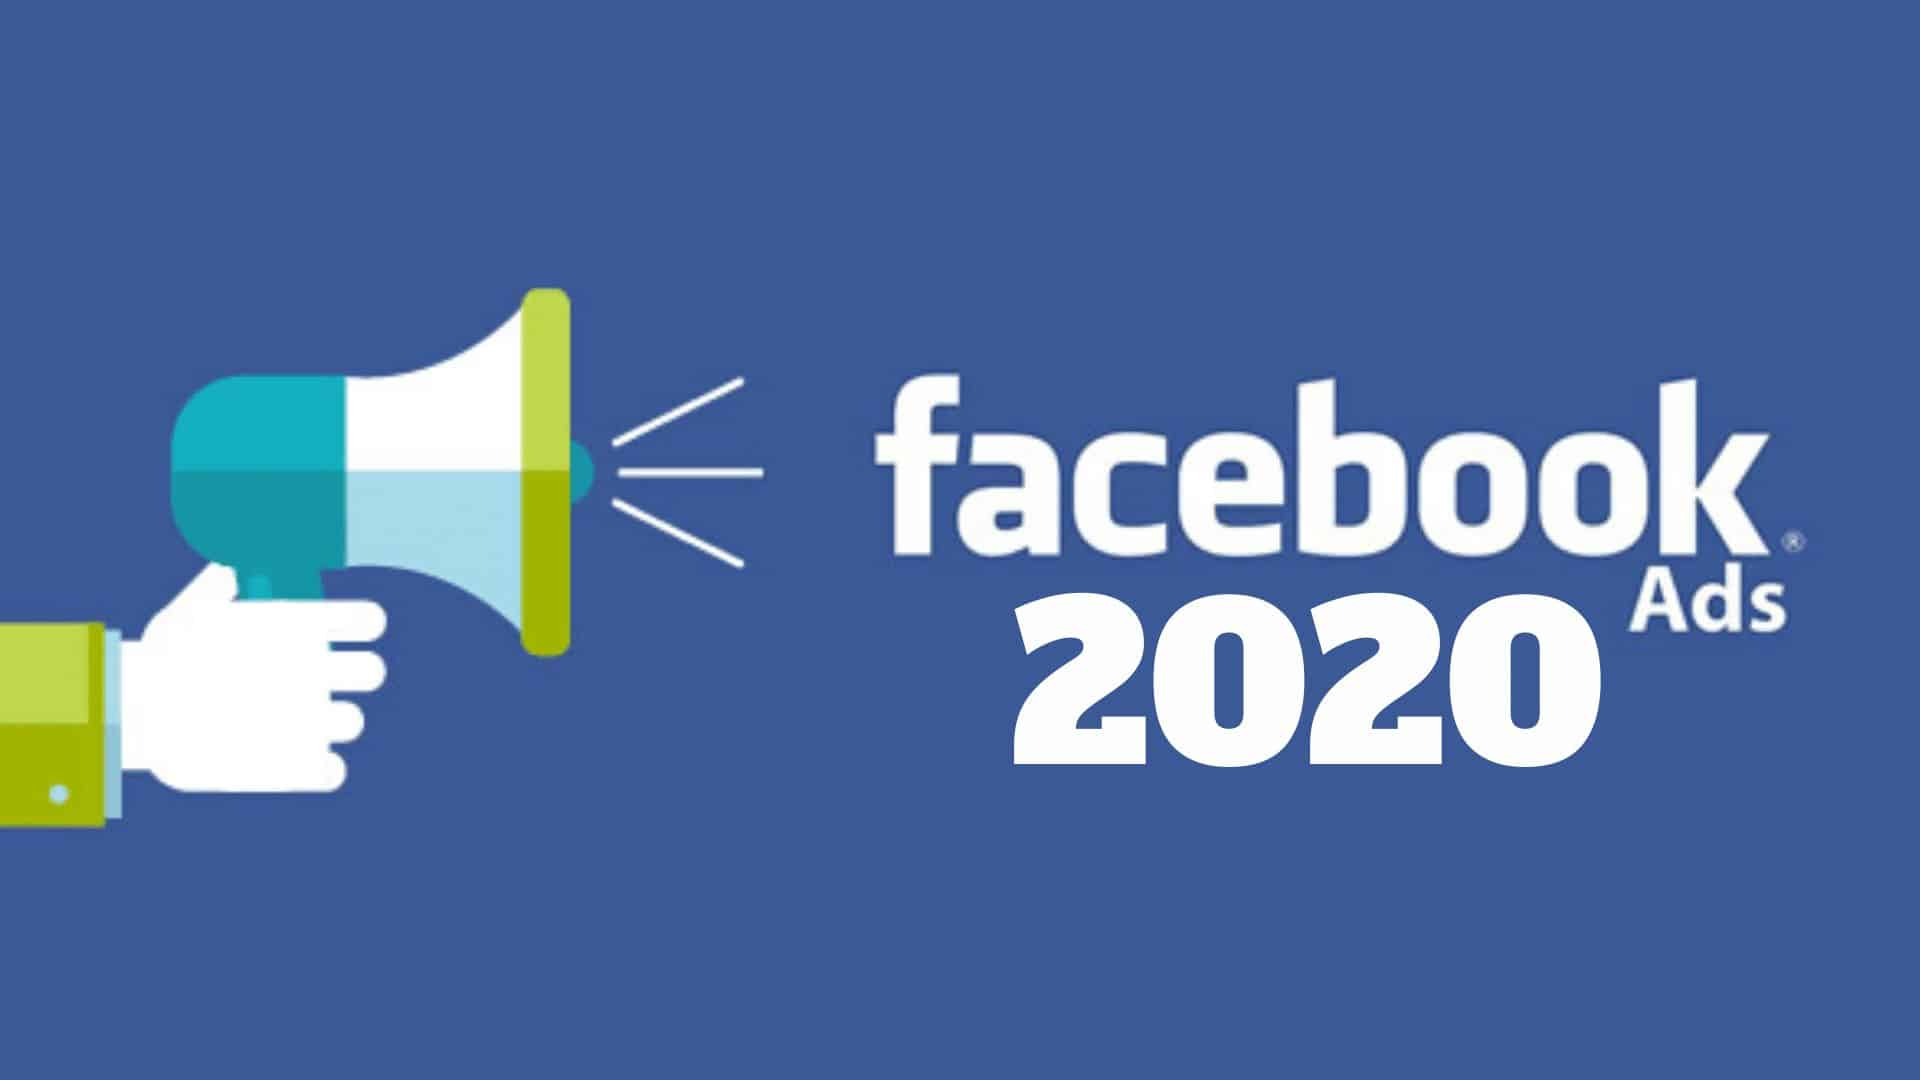 Facebook Ads 2020